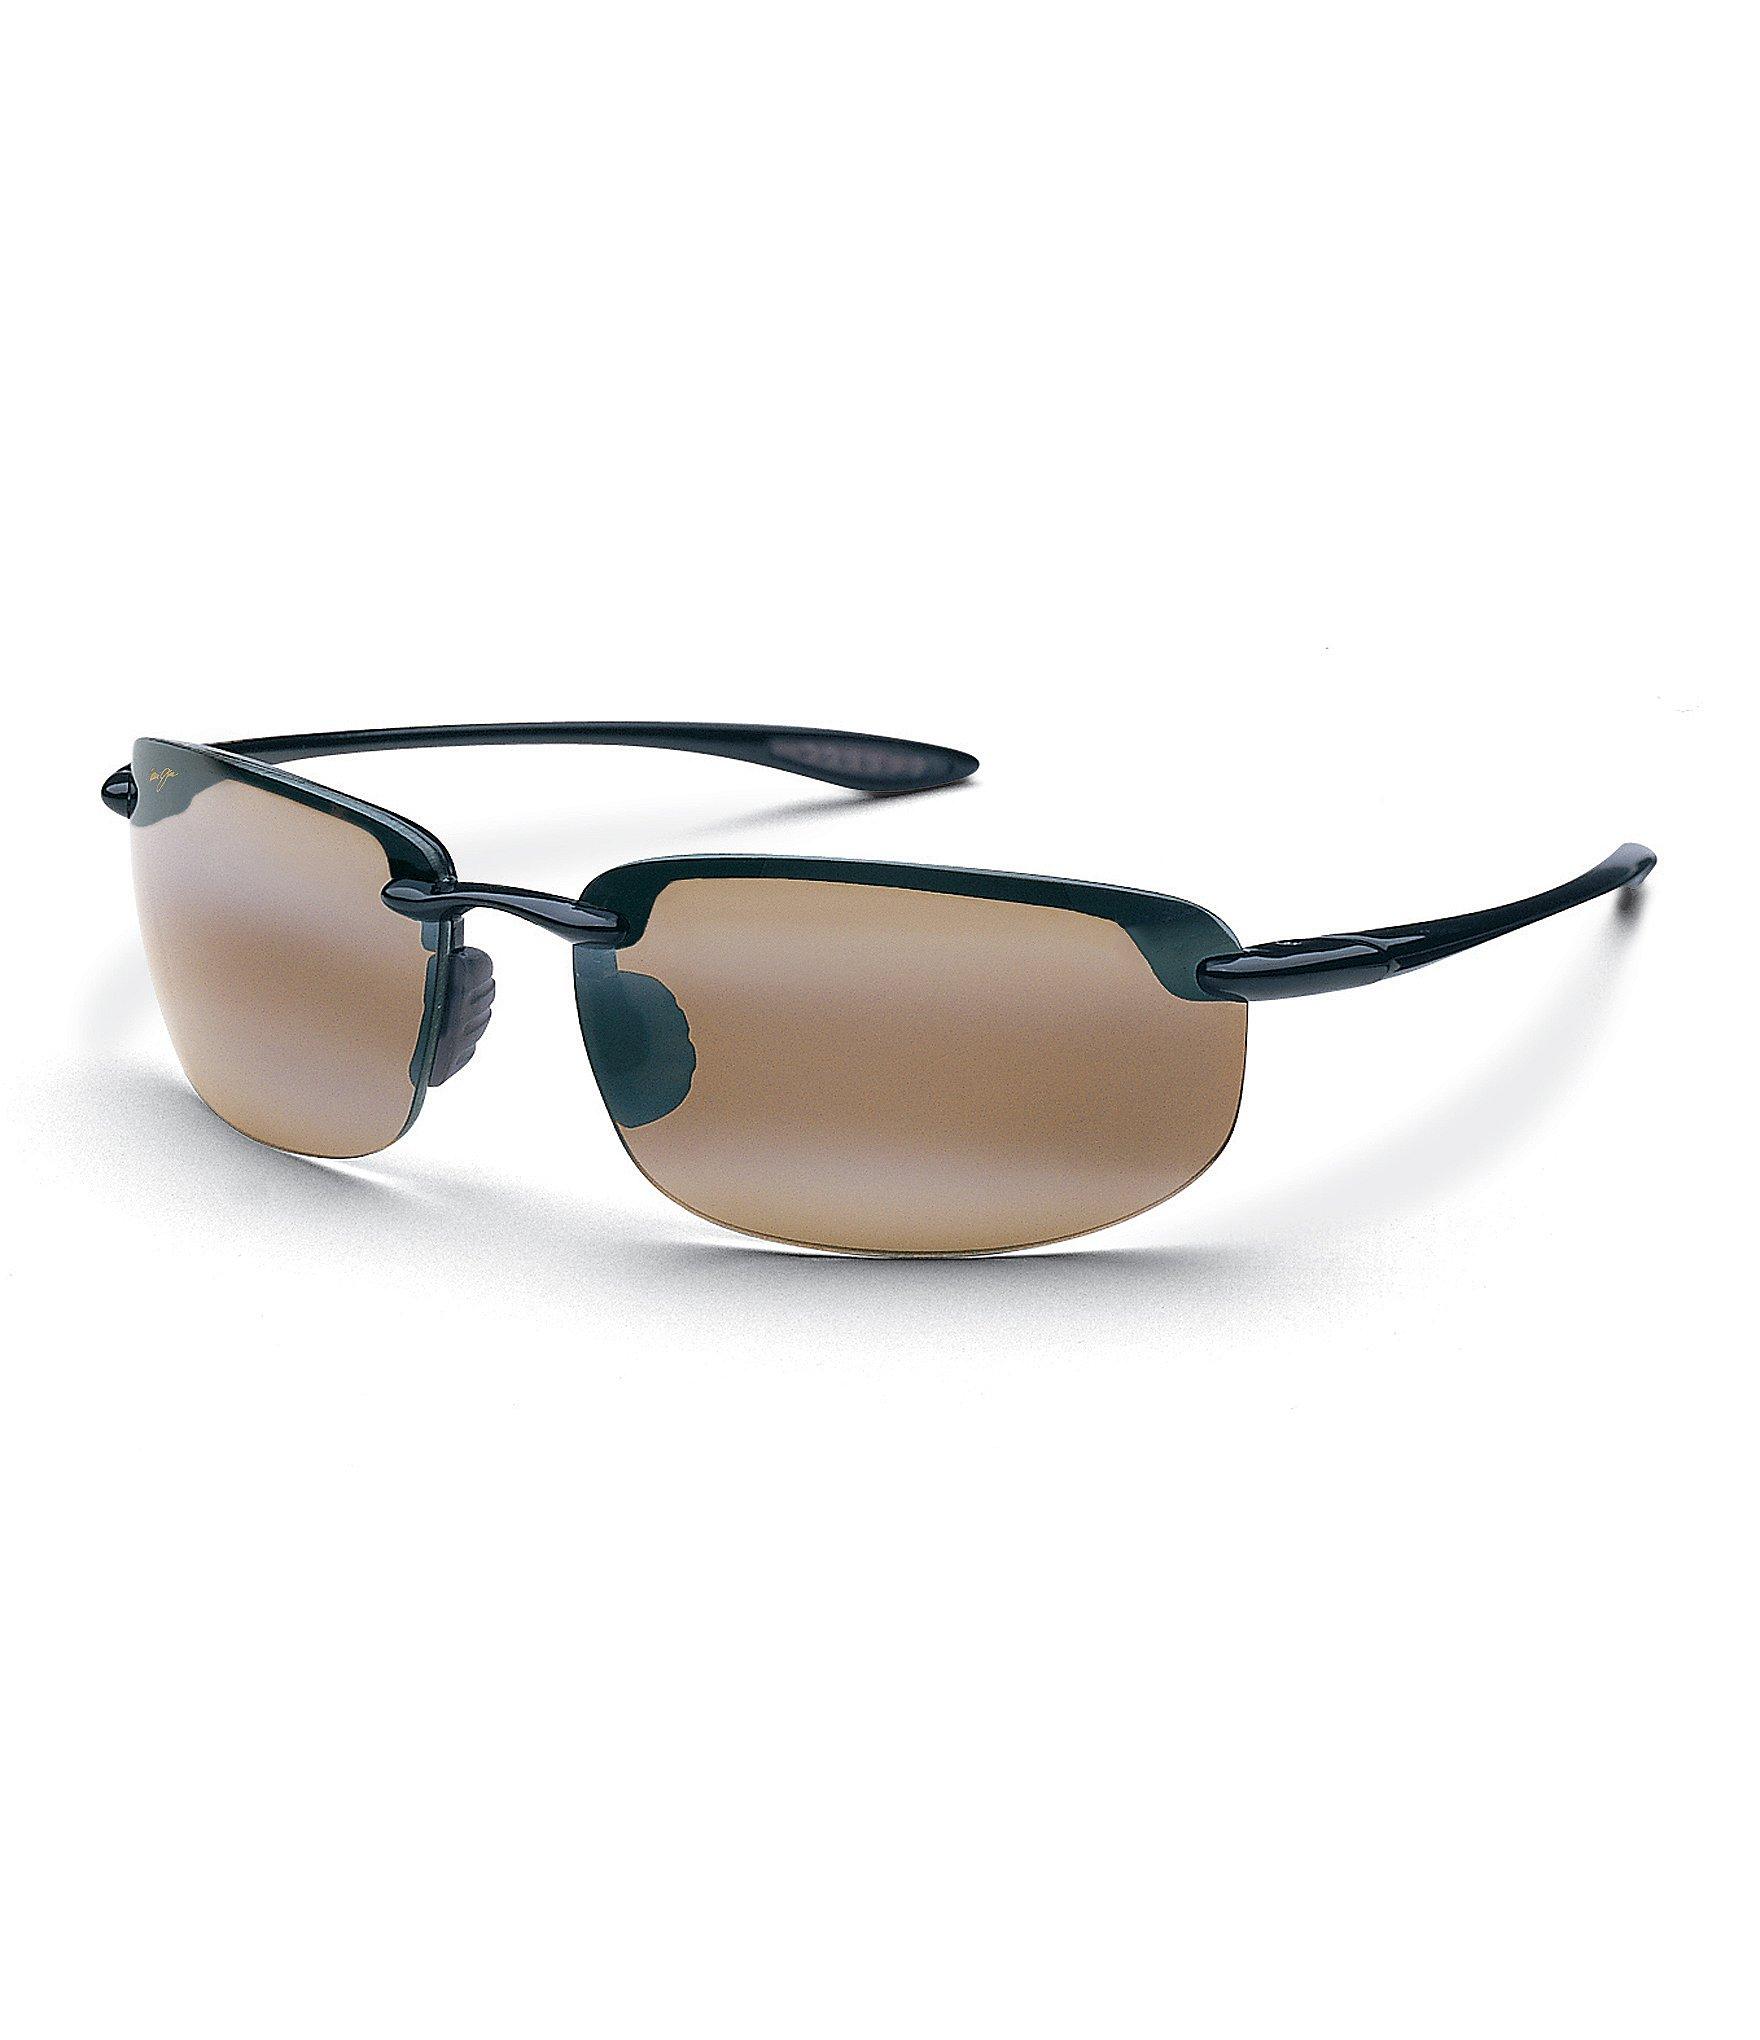 9823aeec08 Maui Jim Multi-misc Men s Polarized Sunglasses